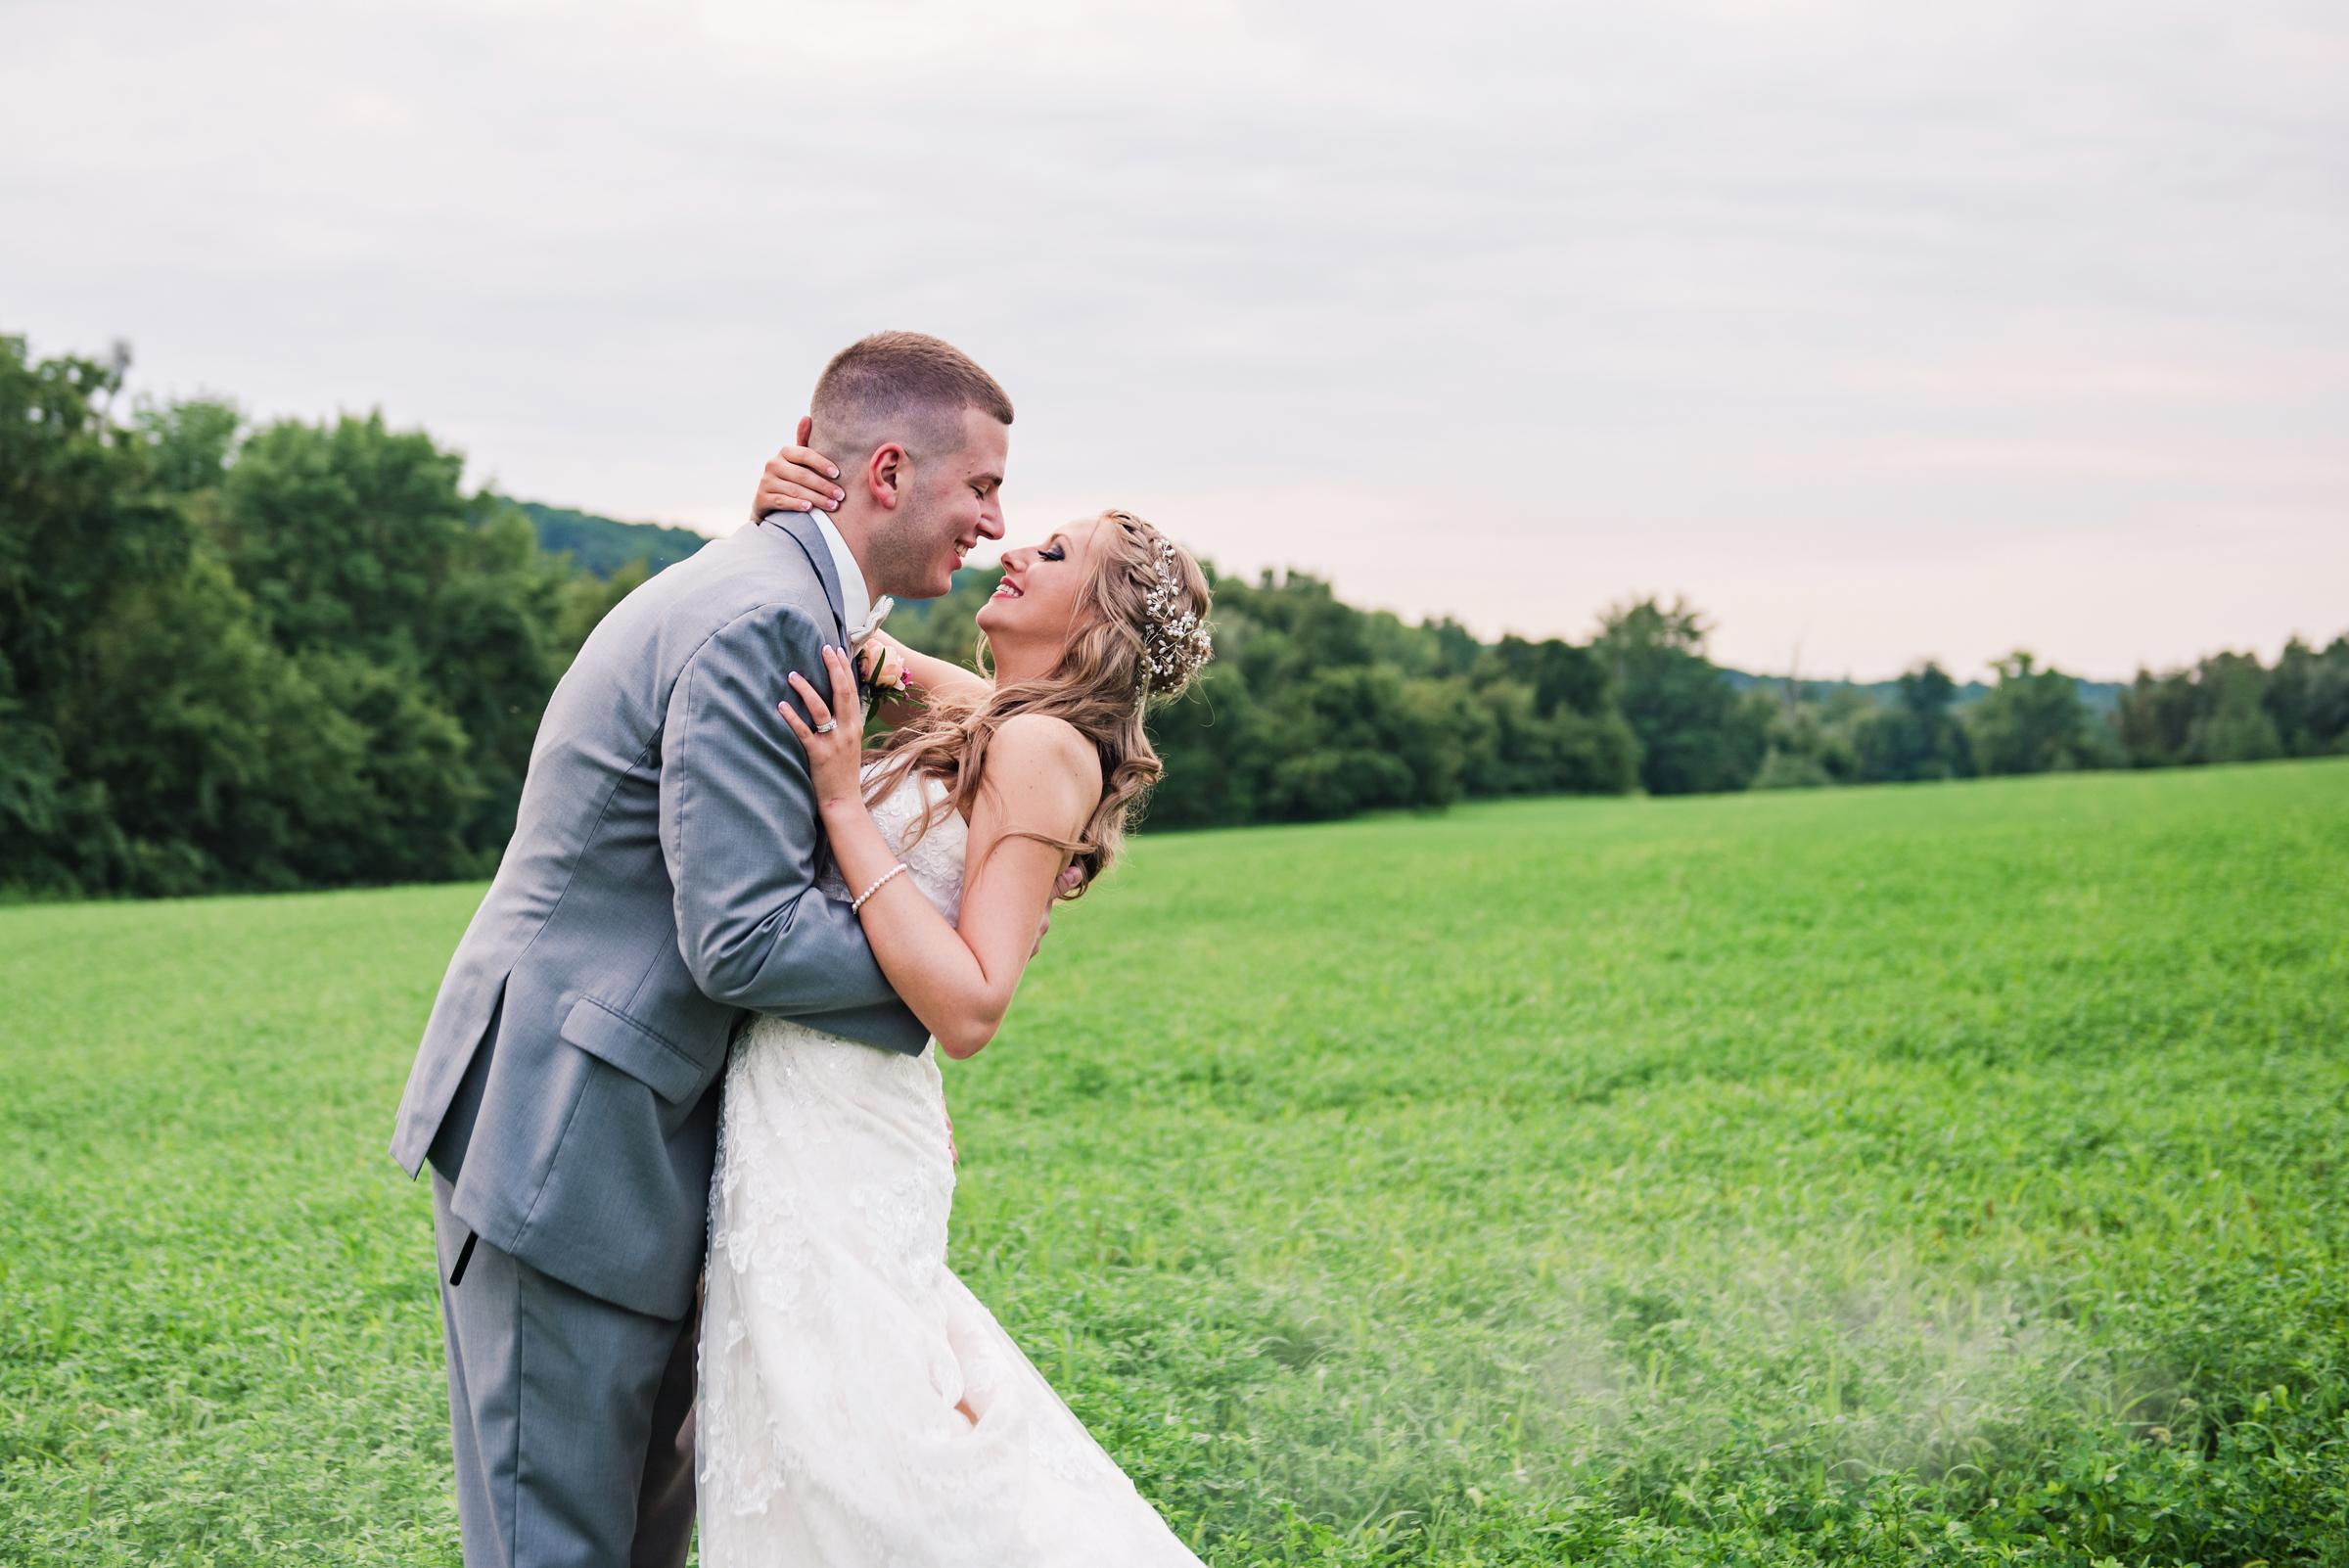 Wolf_Oak_Acres_Central_NY_Wedding_JILL_STUDIO_Rochester_NY_Photographer_DSC_8977.jpg